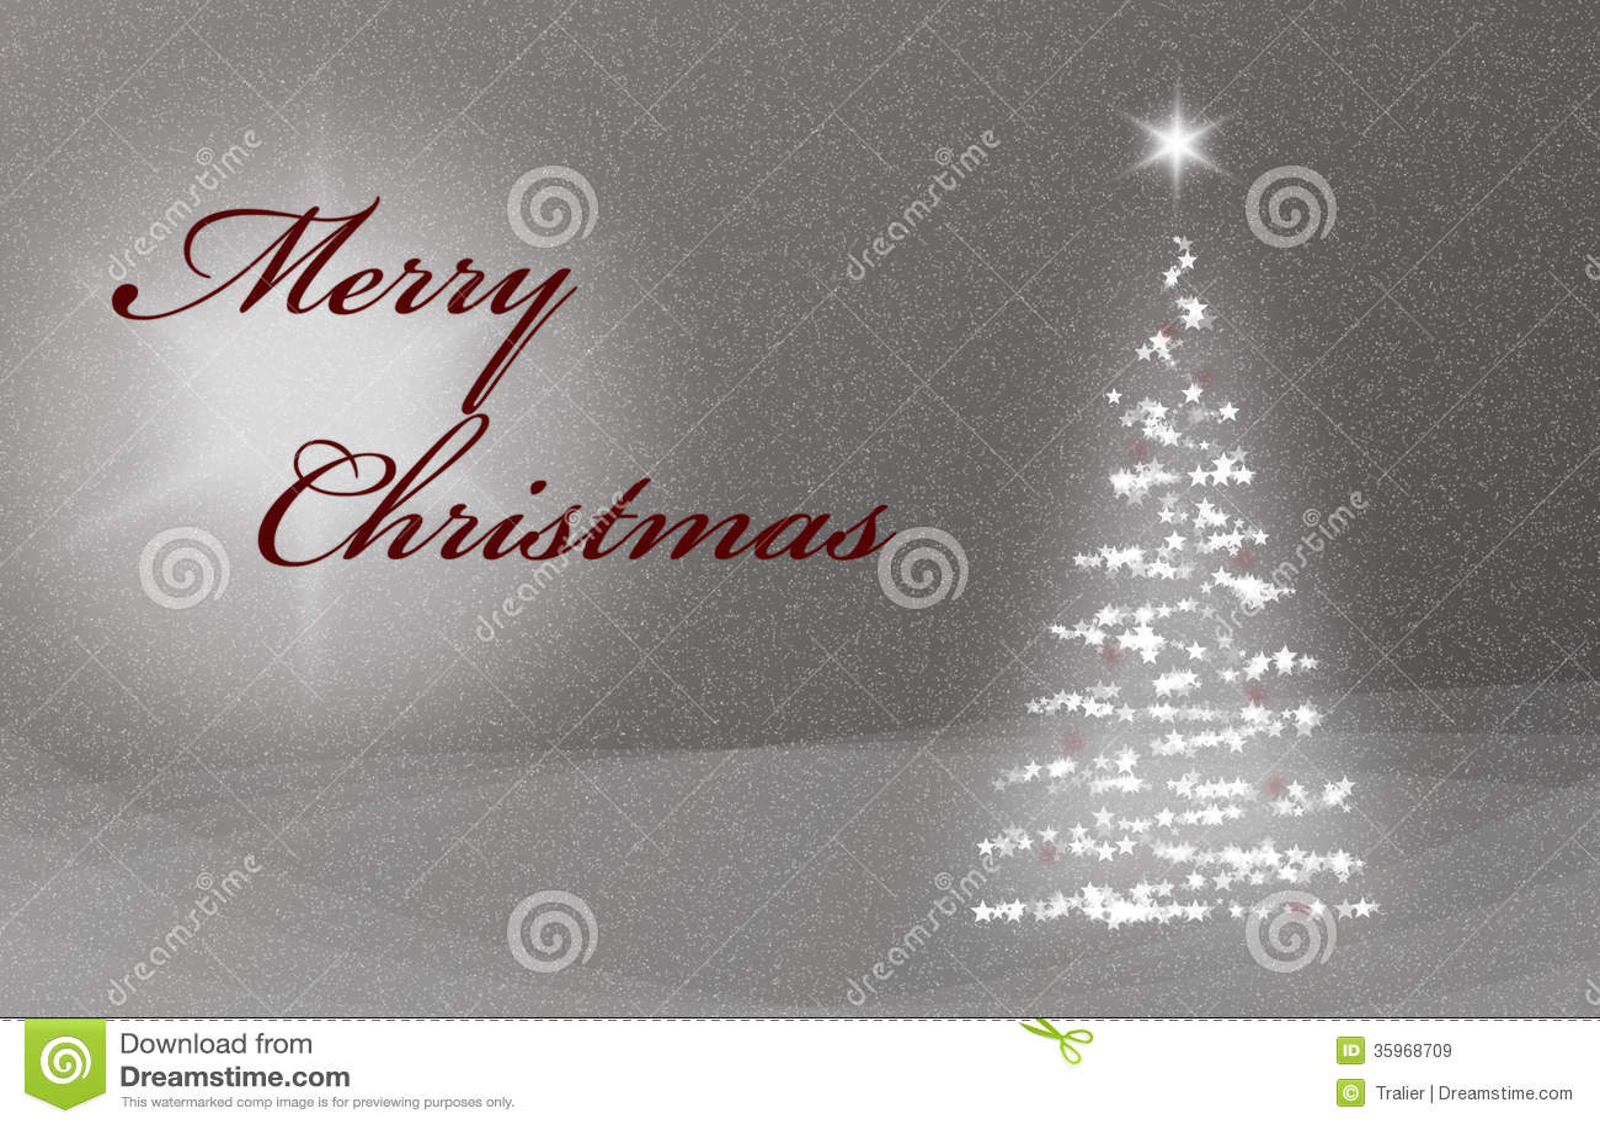 Christmas Card X-Mas Card With Christmastree Snow And ...